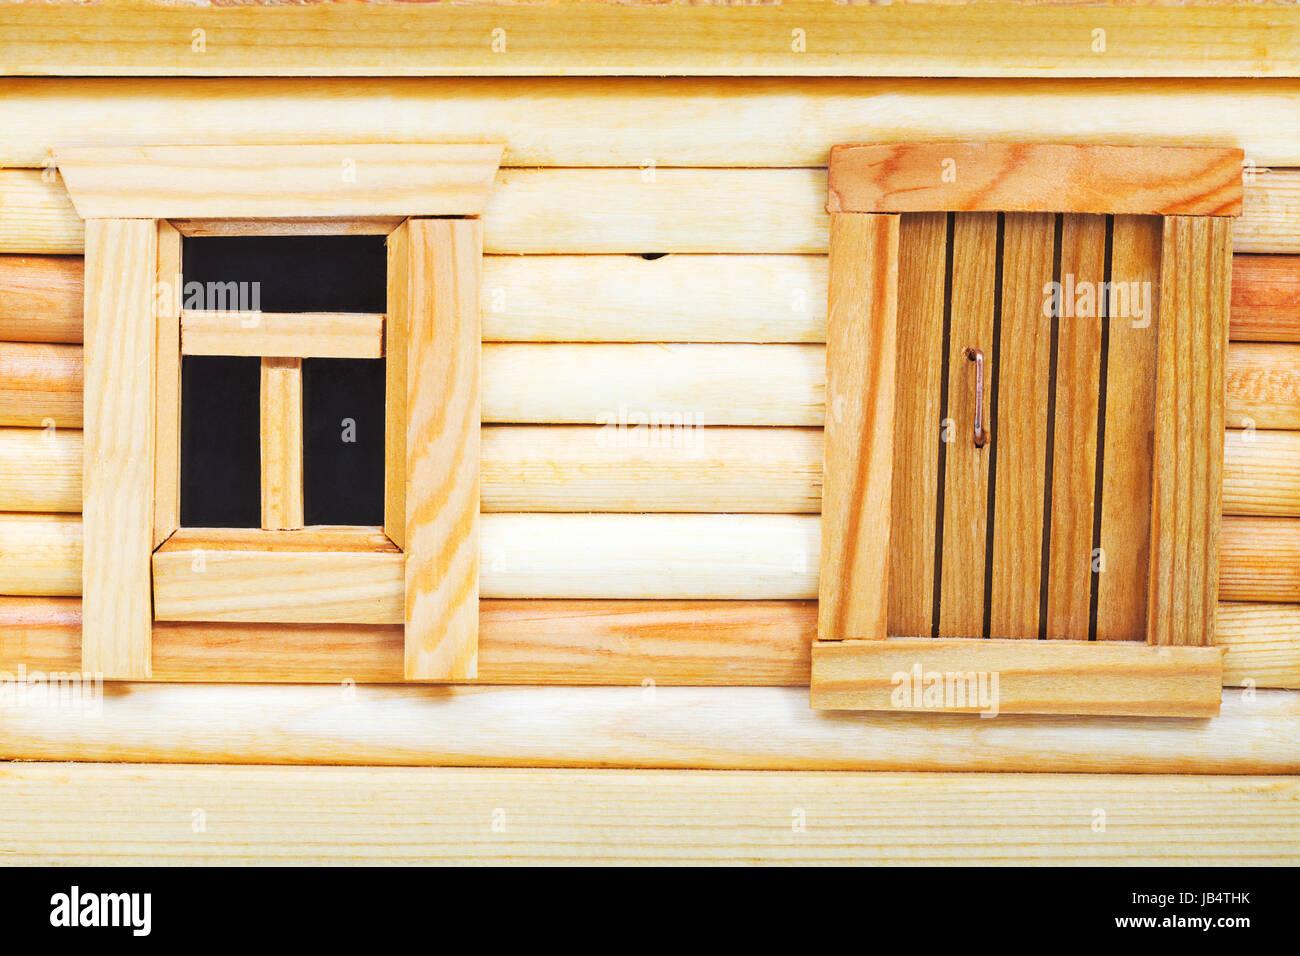 Door And Window Of Model Of Simple Village Wooden Log House